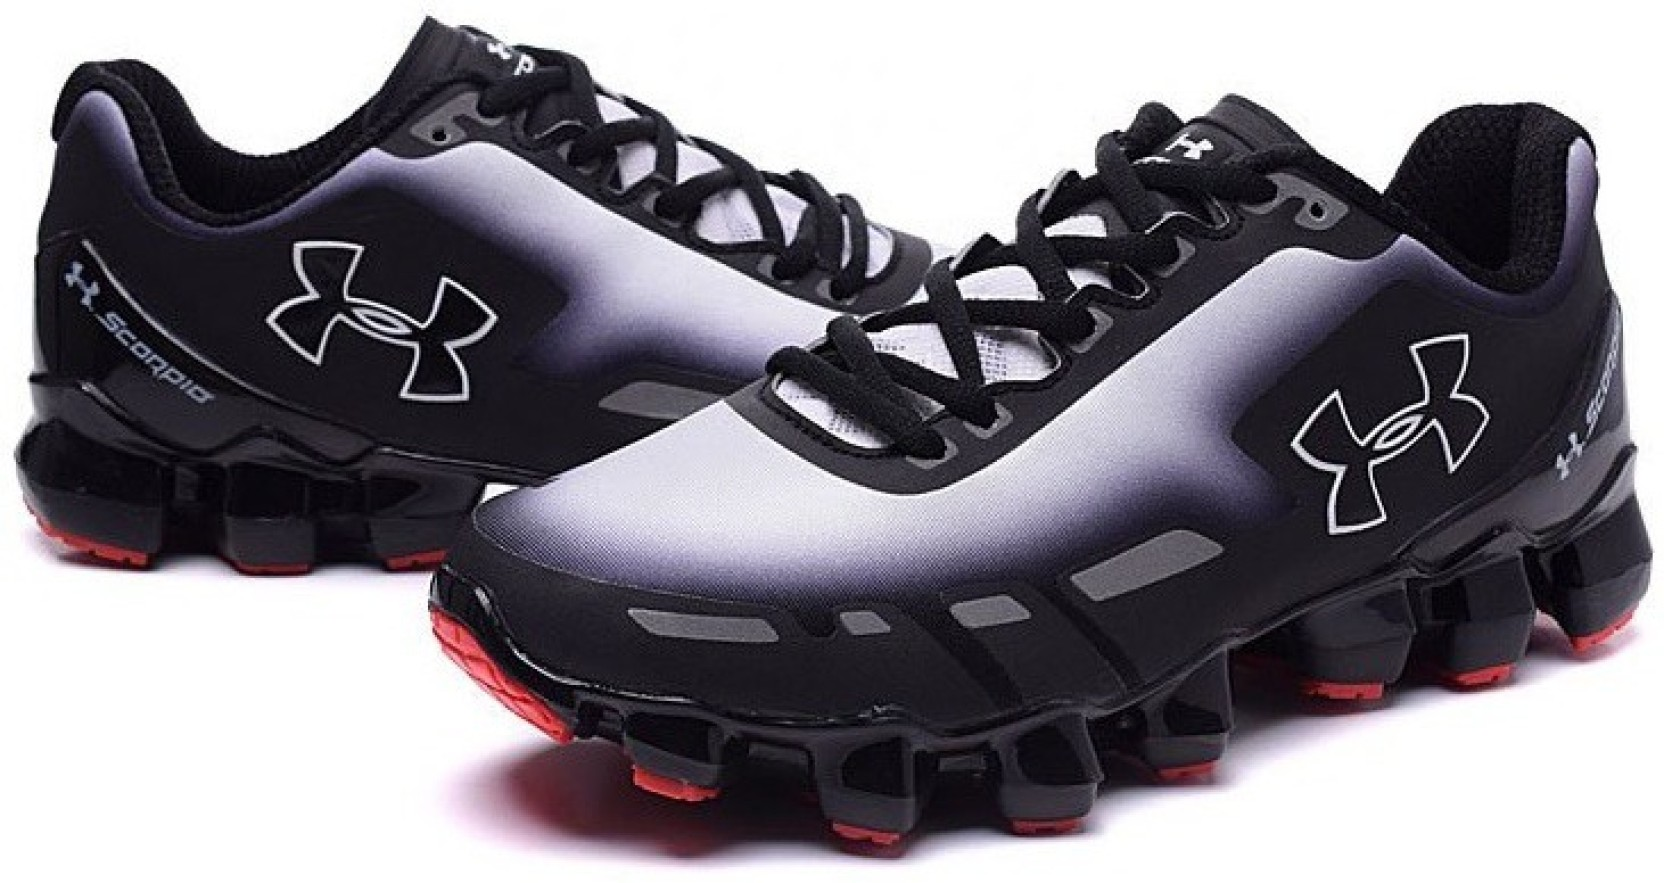 new arrival 88f92 342cc Under Armour Men's UA Scorpio Running Shoes For Men